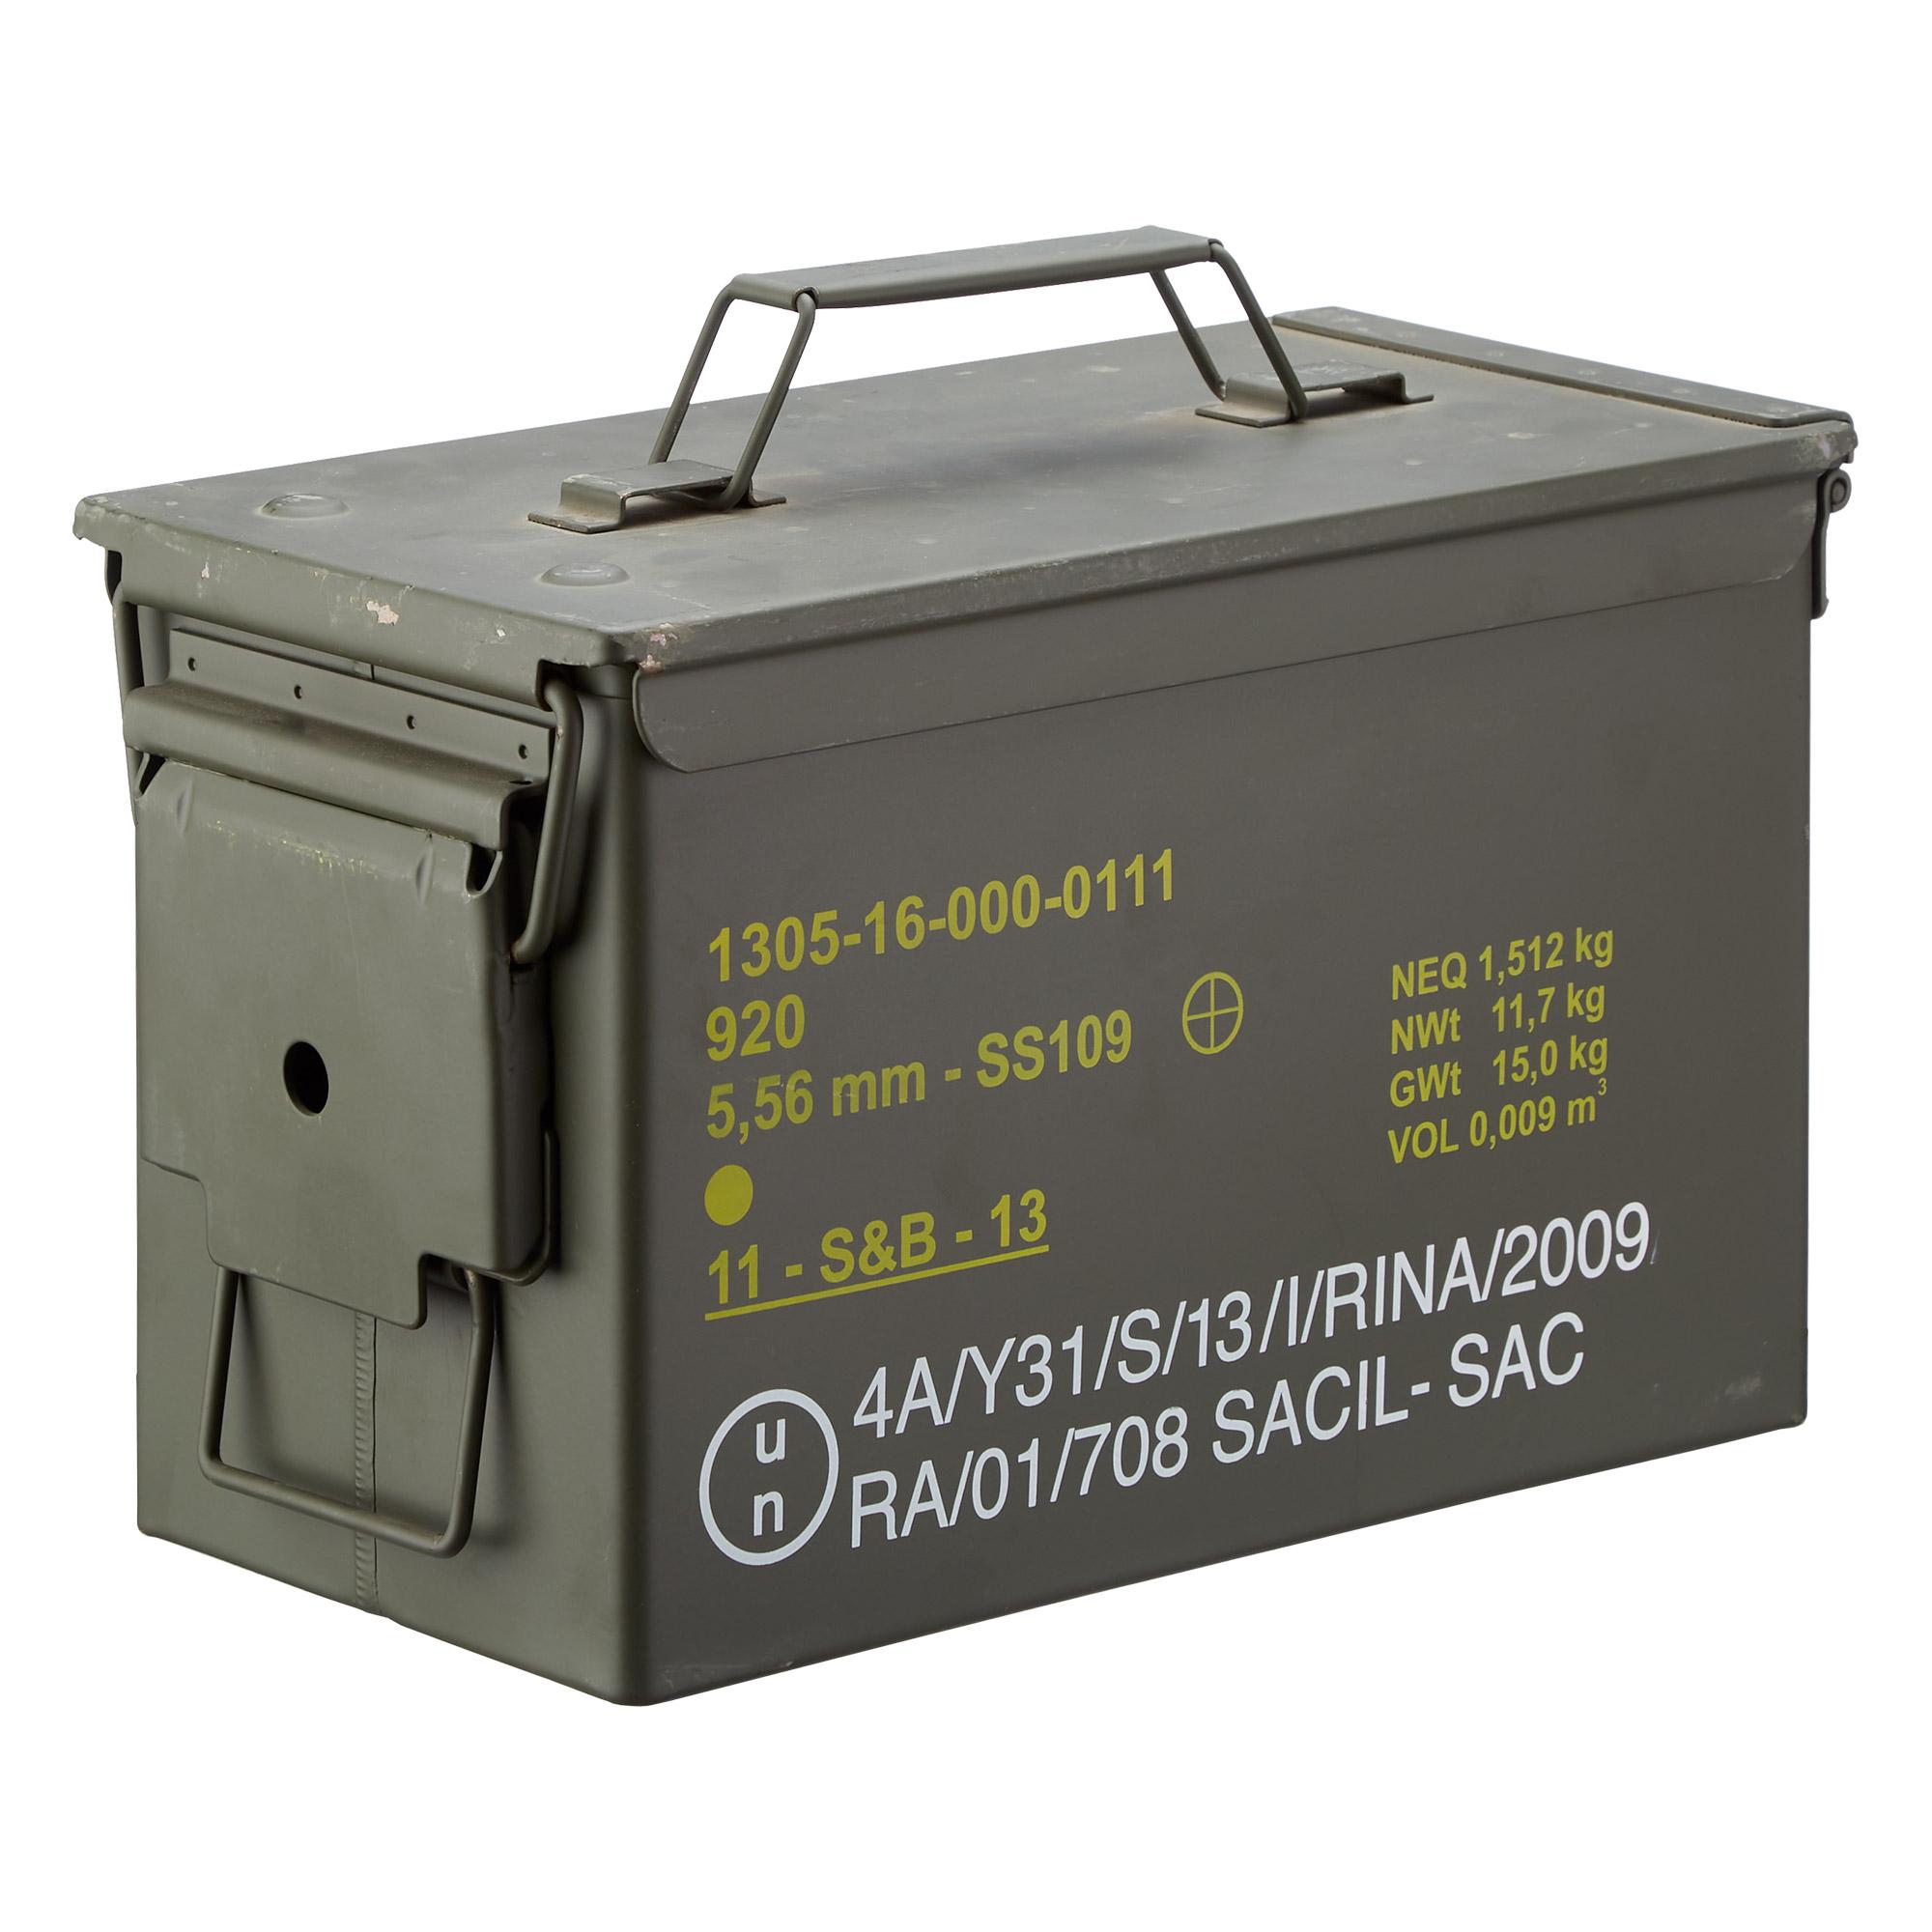 US Munikiste Metall mittel Cal .50/5.56 neuwertig